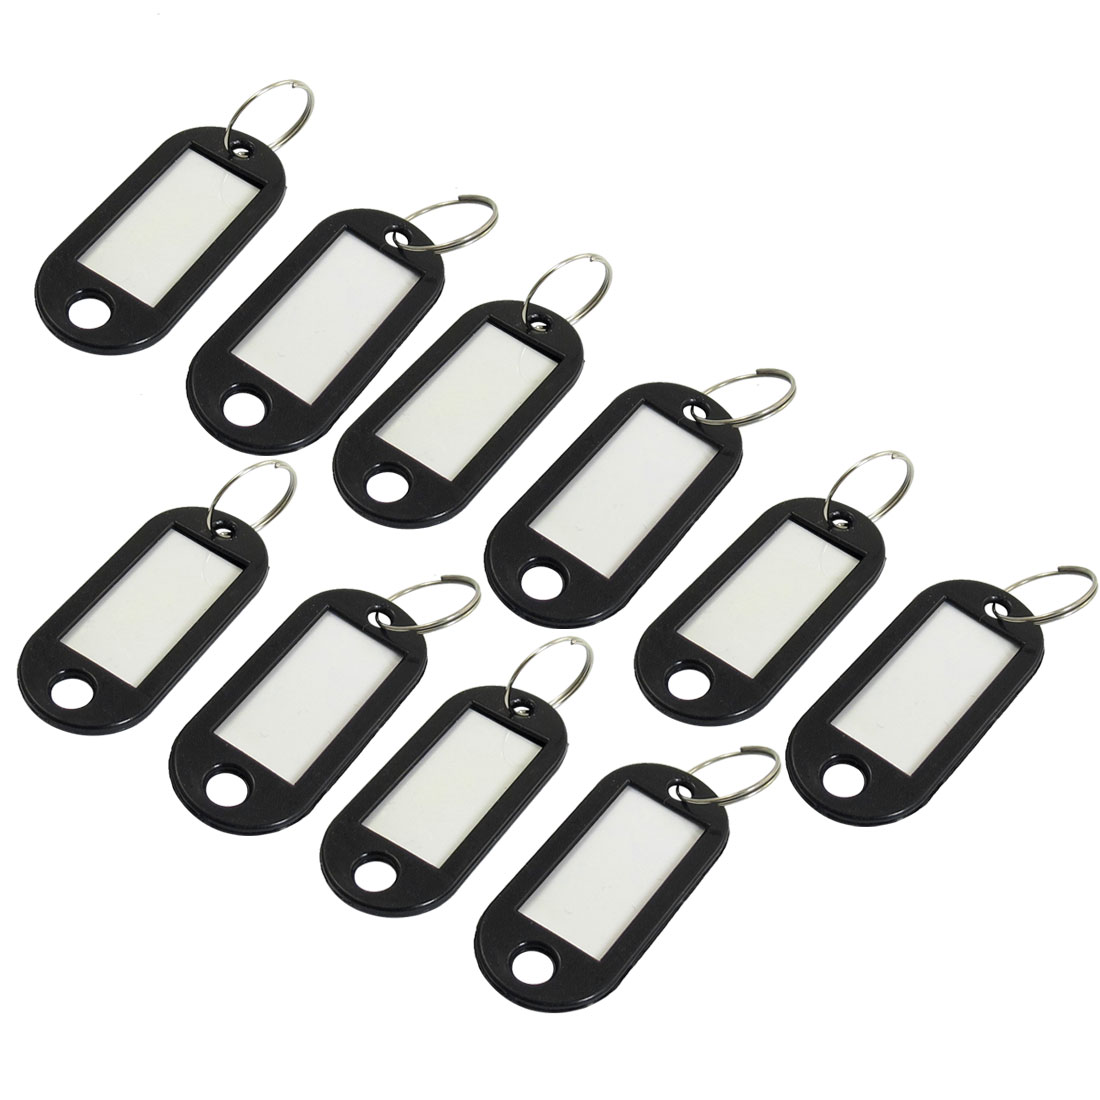 Company Factory Black Plastic Holder ID Key Labels Tags Keyring Keychain 10PCS